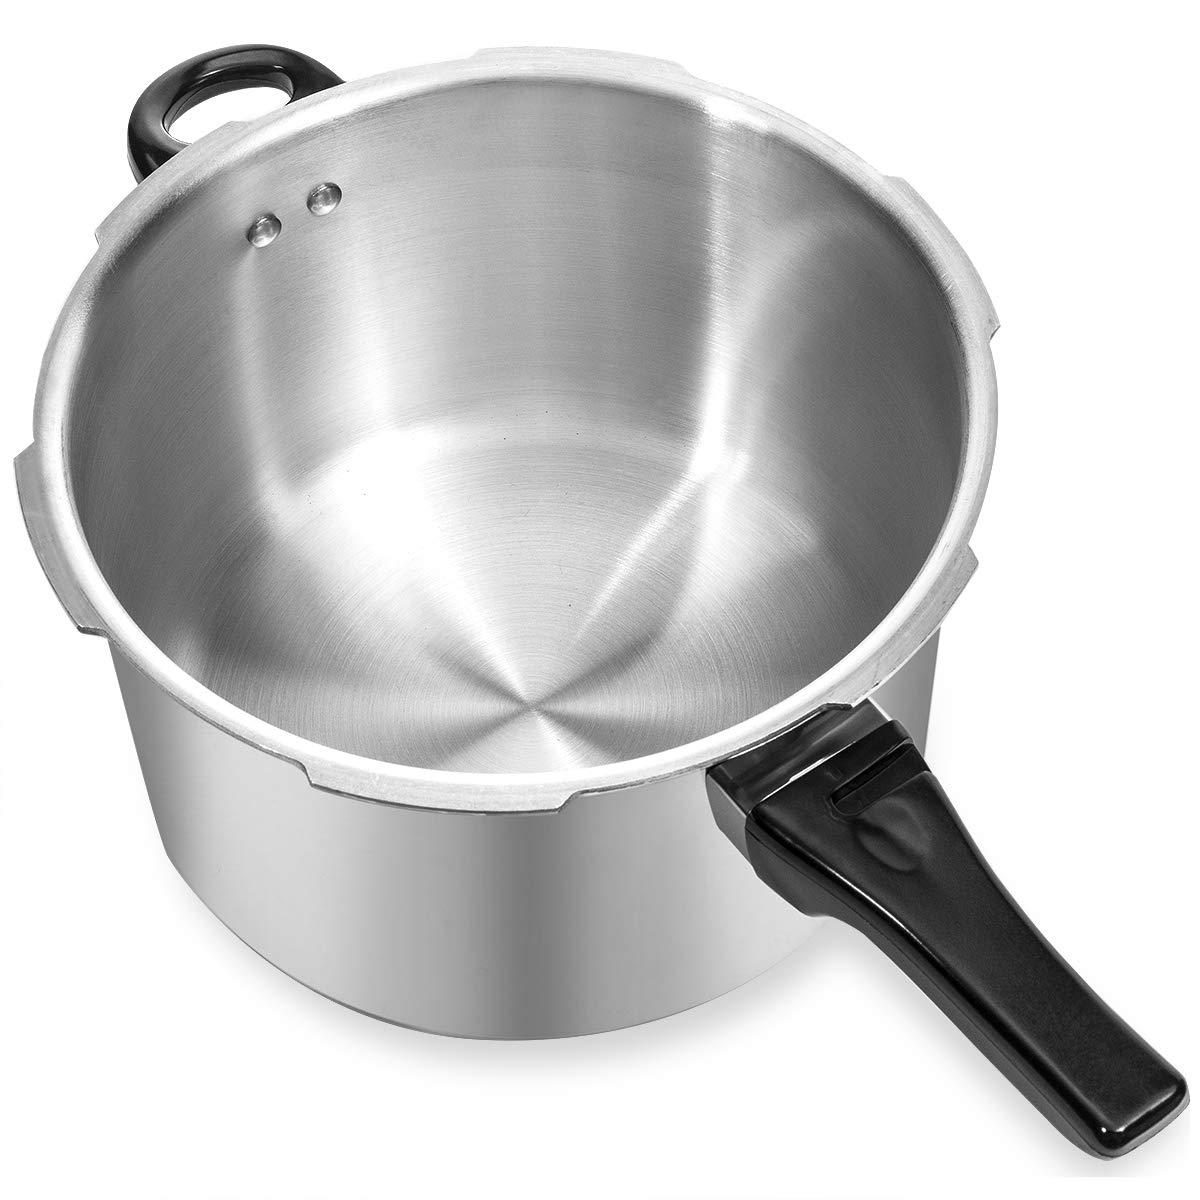 Barton 8-Quart Aluminum Pressure Cooker Stovetop Fast Cooker Pot Pressure Regulator Fast Cooking Steam Release Valve by Barton (Image #6)